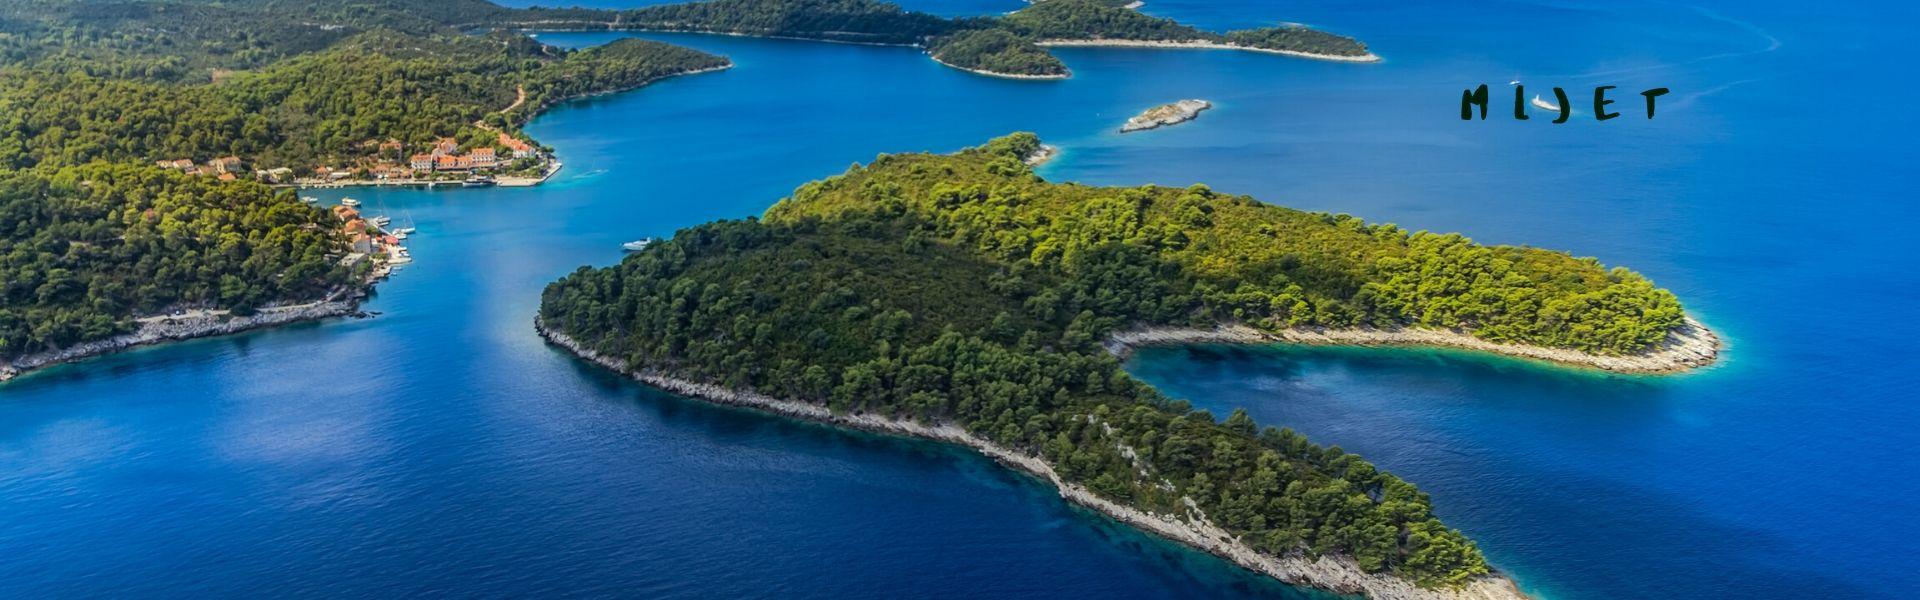 Mljet island boat charter